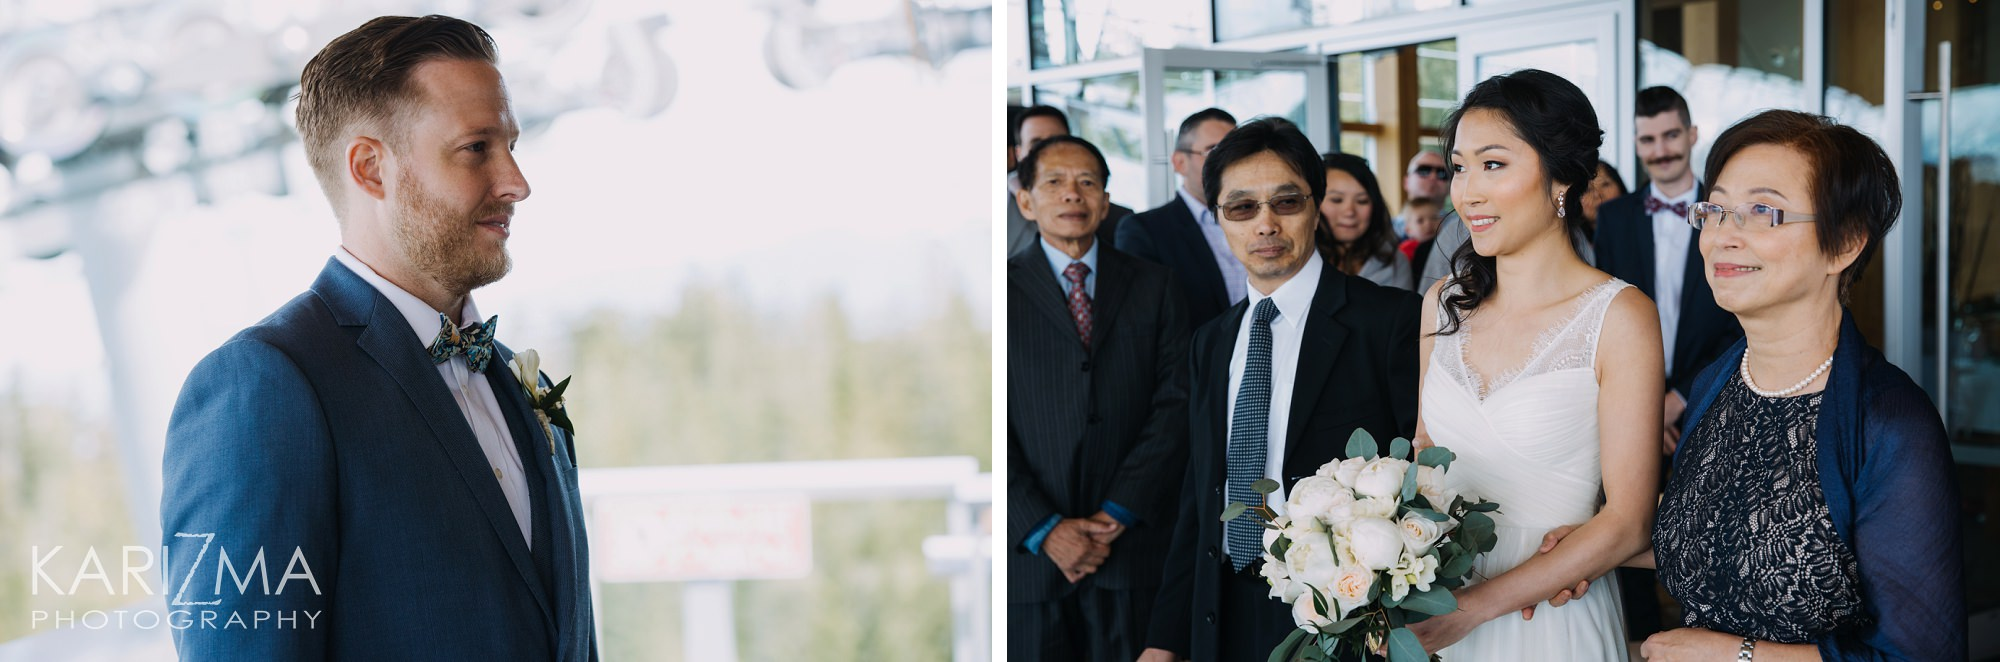 Sea to Sky Gondola Wedding Ceremony